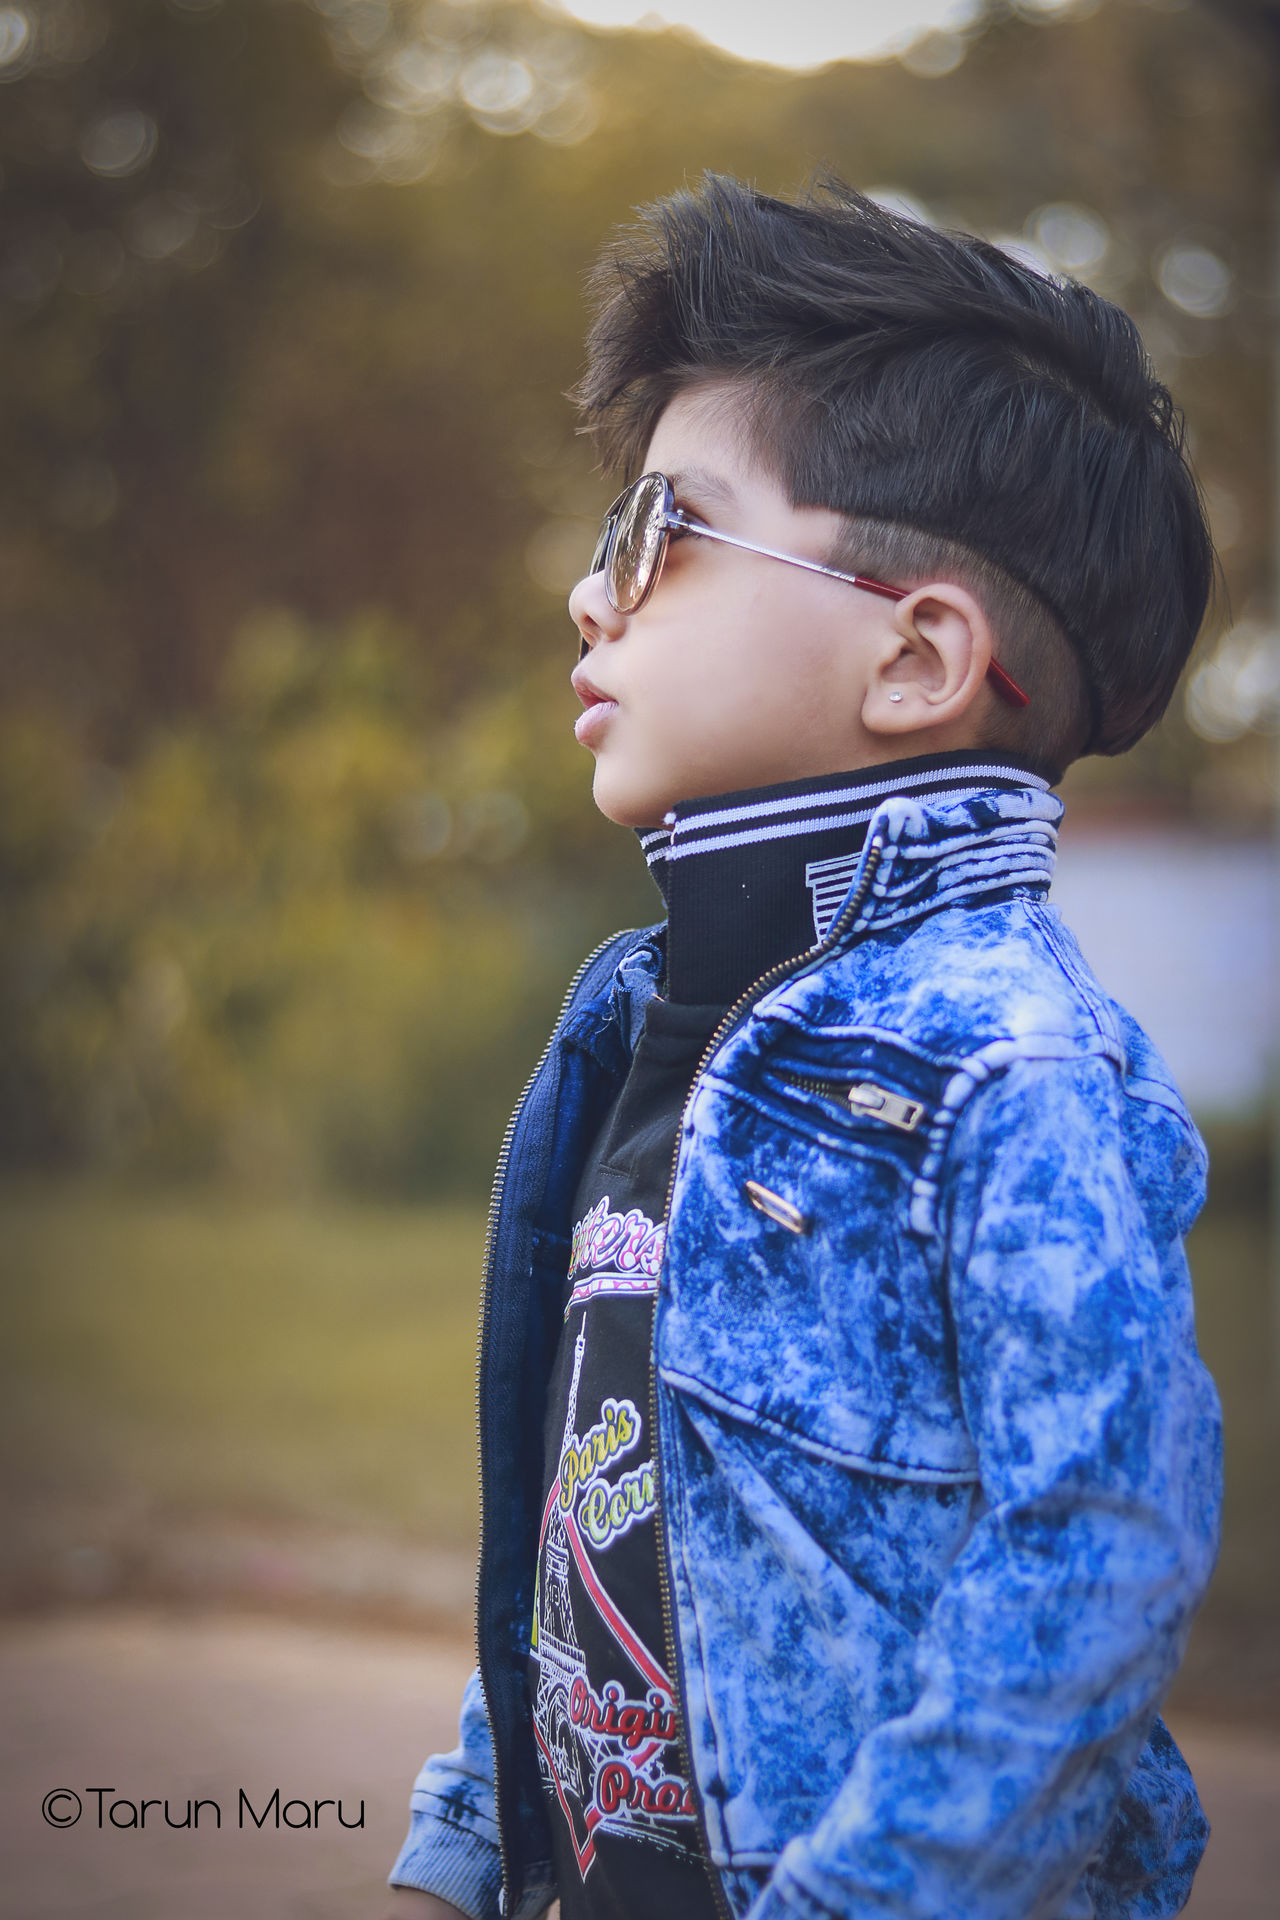 Childhood Serious Eyeglasses  Sunglasses Portrait Child Outdoors Attitude Warm Clothing Swag Swaggy Swagger  Swagg Swagger  Swaggin Cool Kids Cool Attitude Fashion Classy Stylish Boy Stylish Look Smart Cute Sweet